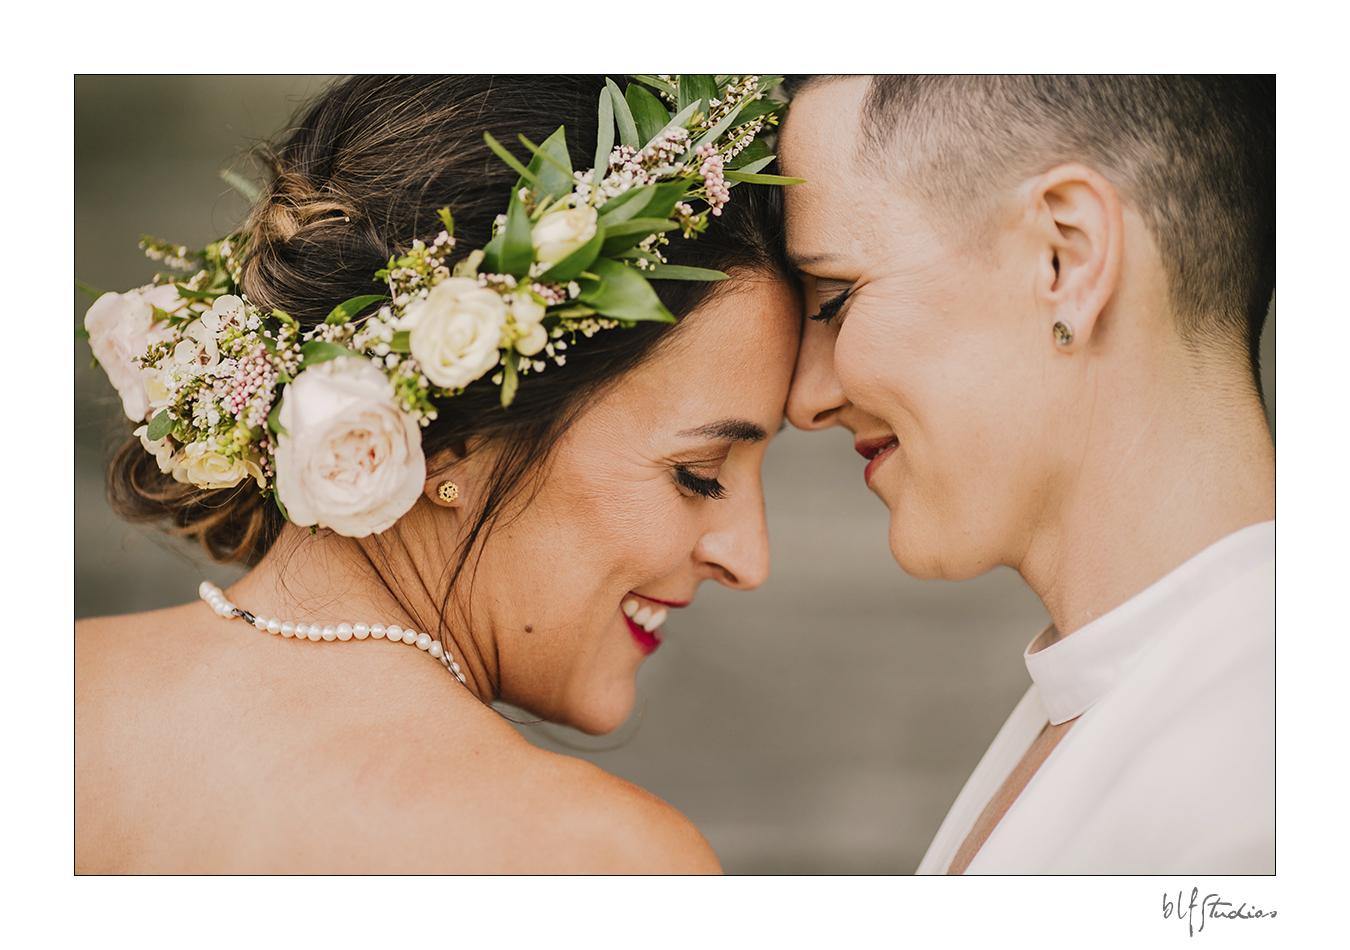 014-winnipeg-hitchnpost-wedding-marla-alana.jpg